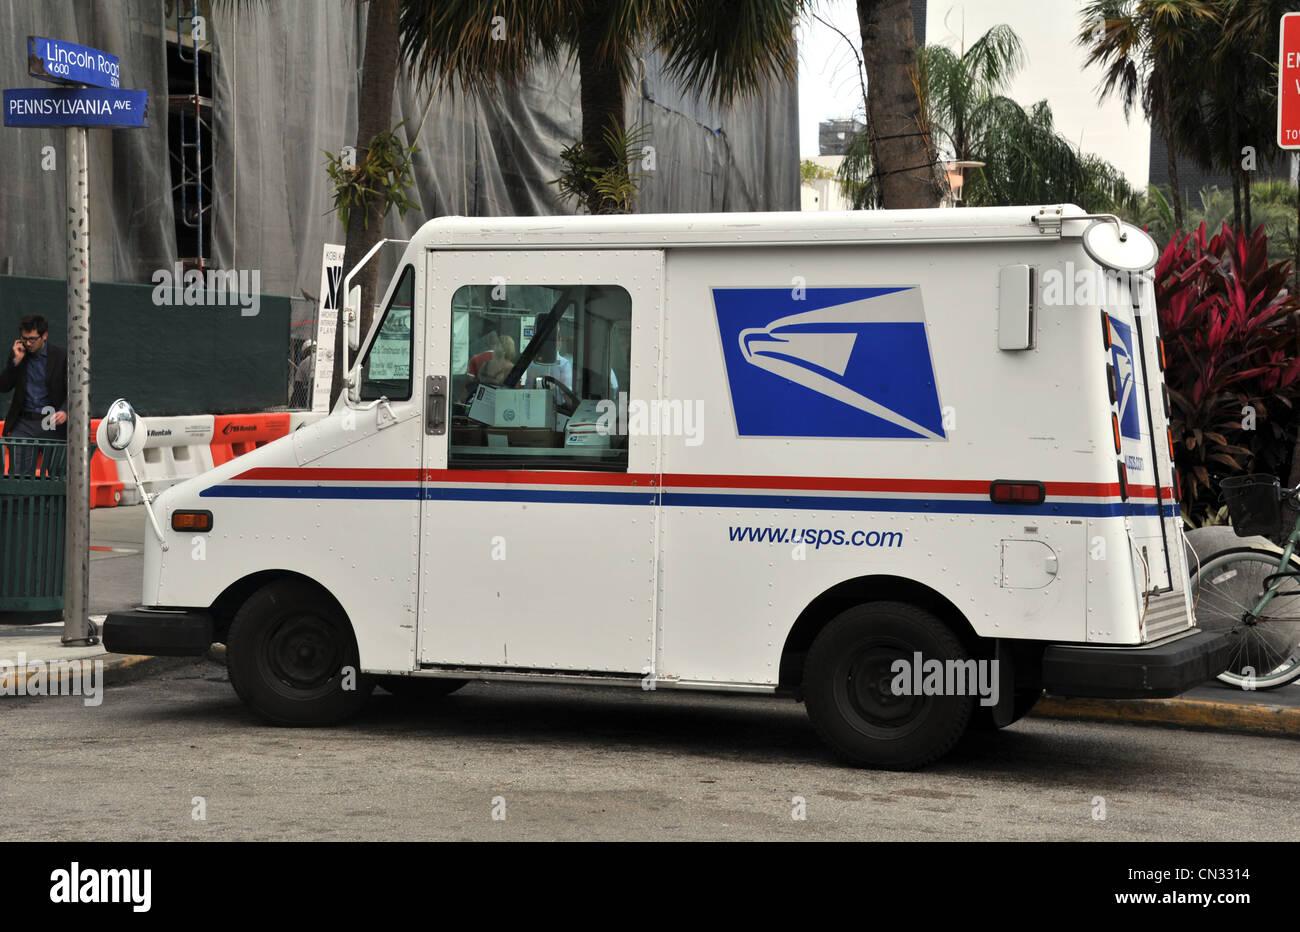 United States Postal Service delivery van, USA Banque D'Images